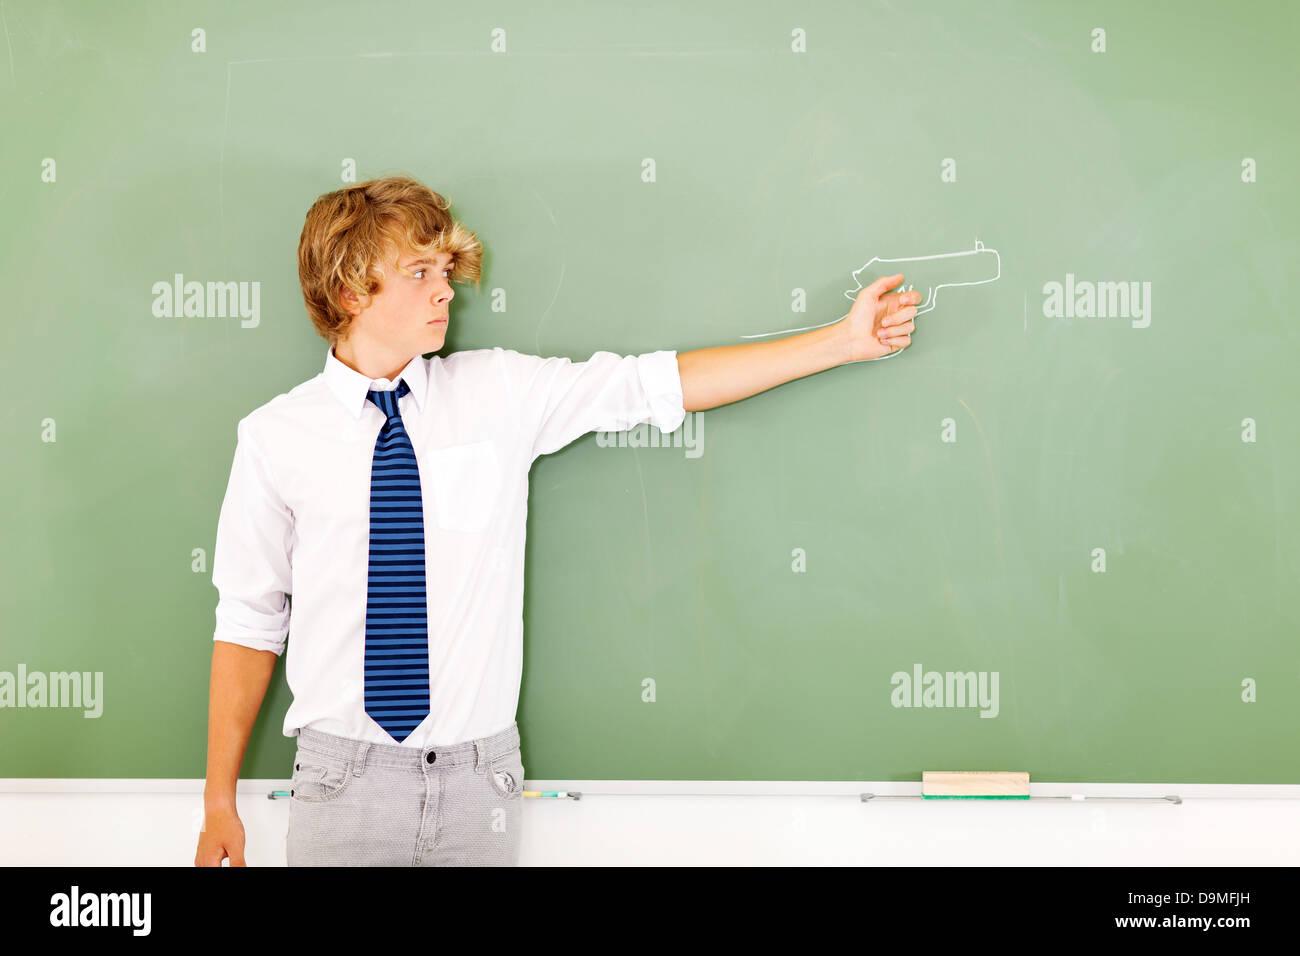 violent high school boy holding a gun drawn on chalkboard - Stock Image